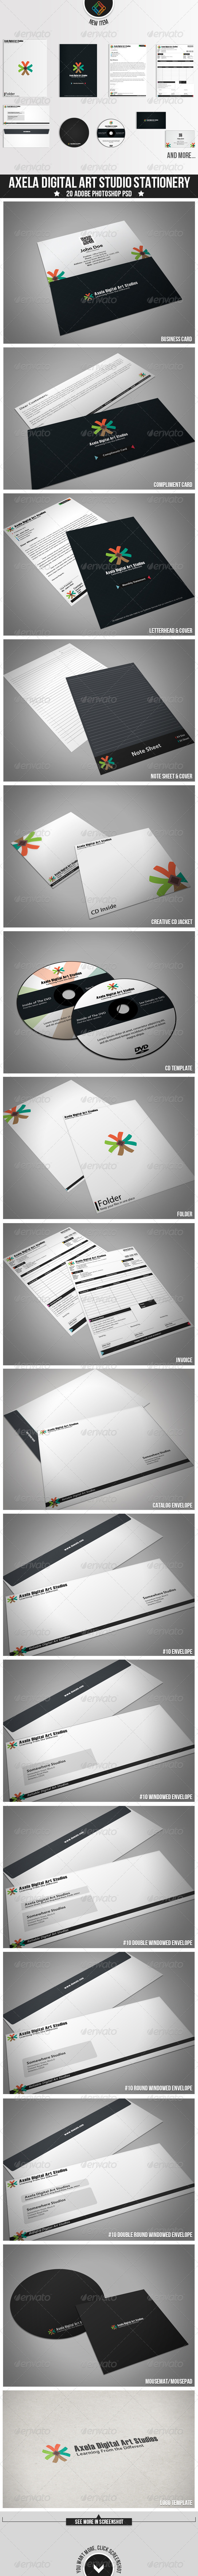 GraphicRiver Axela Digital Art Studios Stationery 3423414